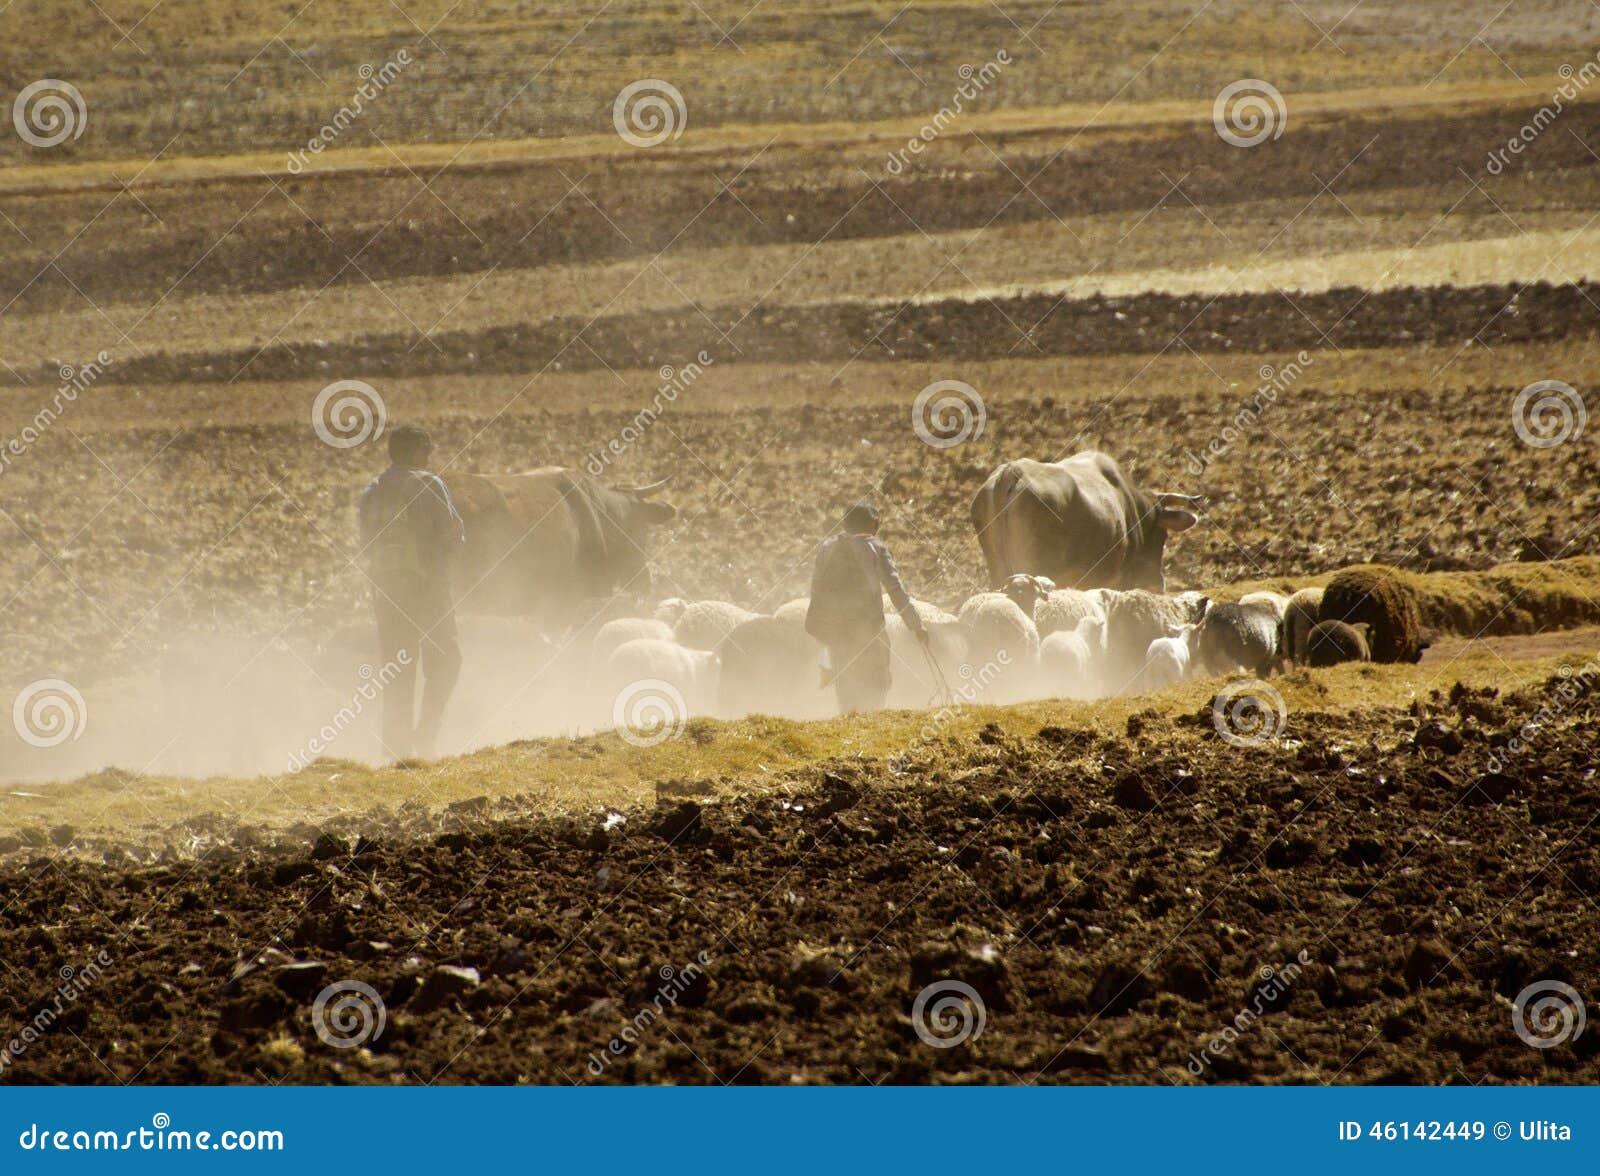 El paisaje, polvo, condujo, valle sagrado, Perú rural